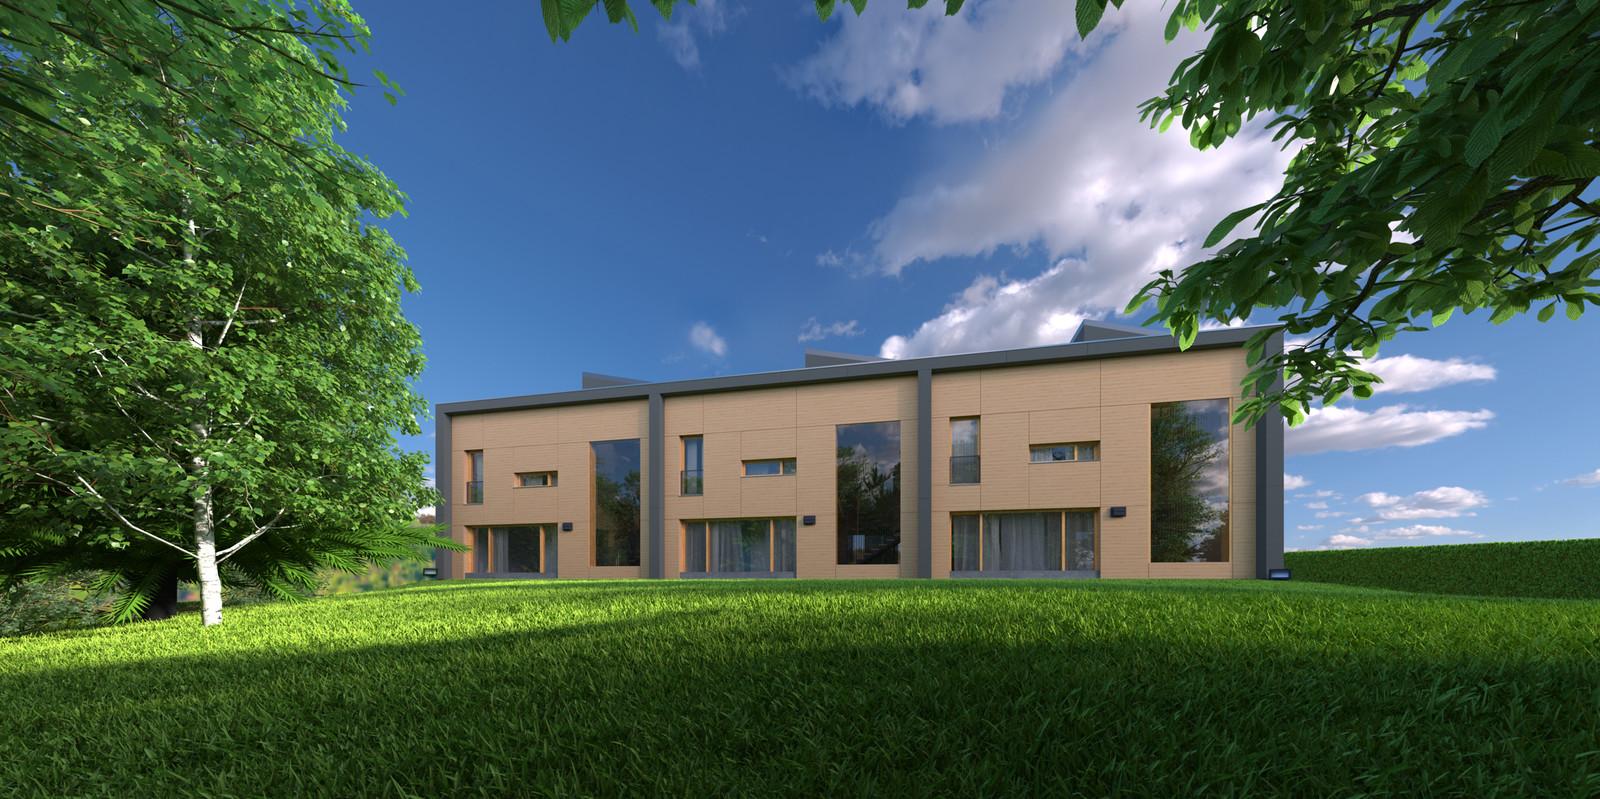 04 Exterior N ground New 03B A  KP webpage of project: http://www.kemppro.com/KP_3D_communication_3_Villas_Veyrier.html